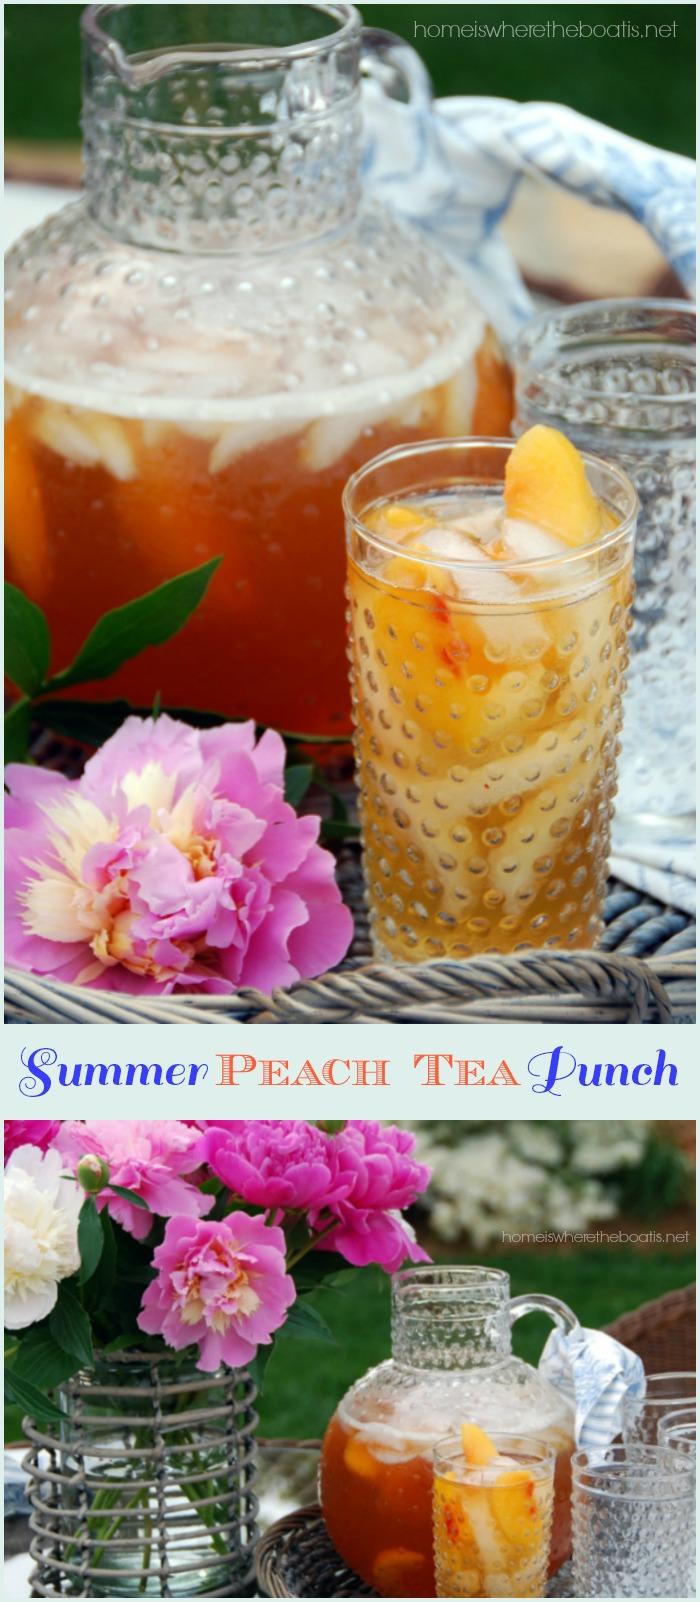 Summer Peach Iced Tea Punch